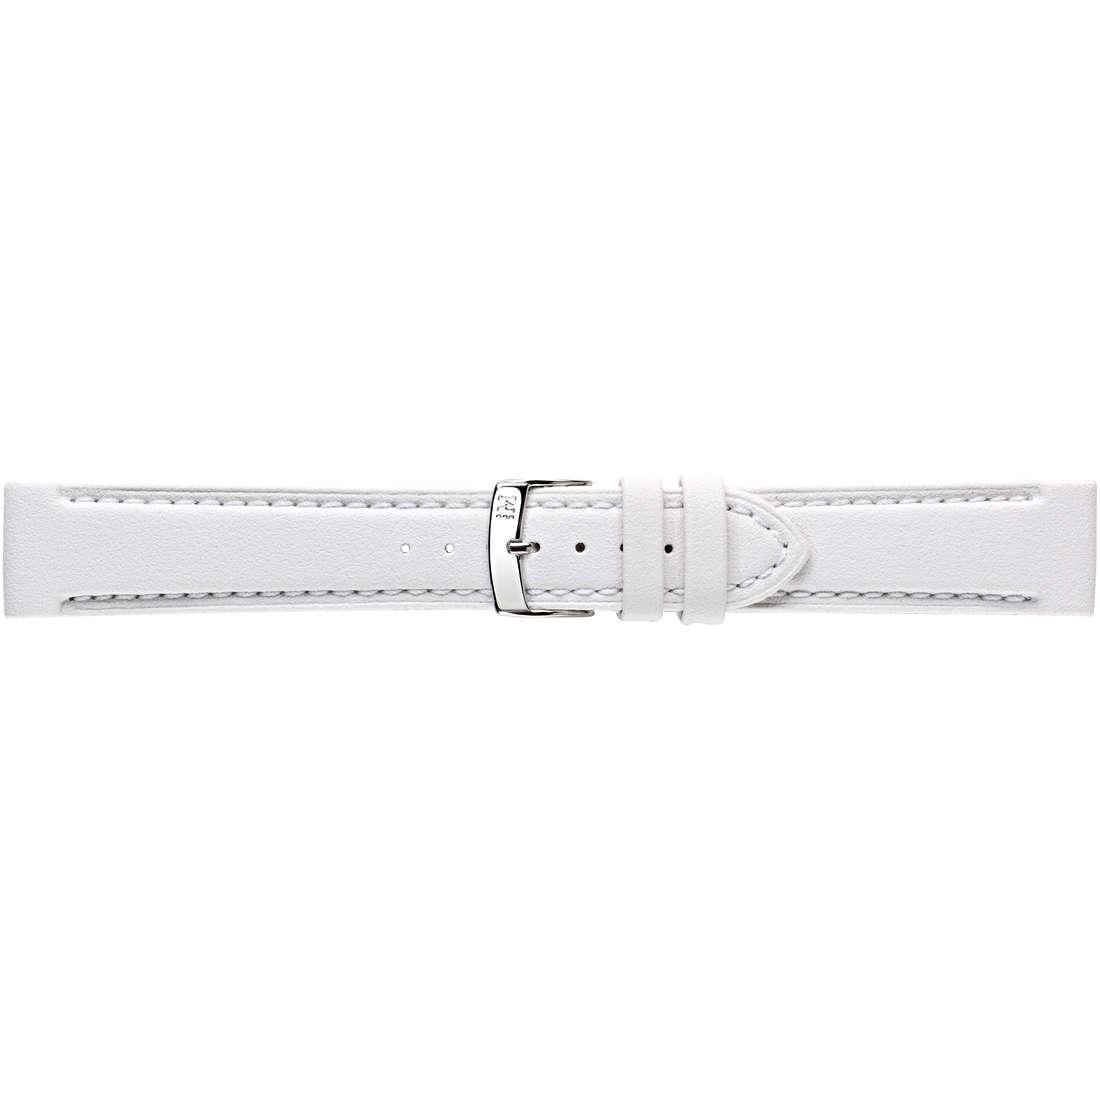 watch watch bands watch straps man Morellato Linea Sport A01U3822A42017CR22